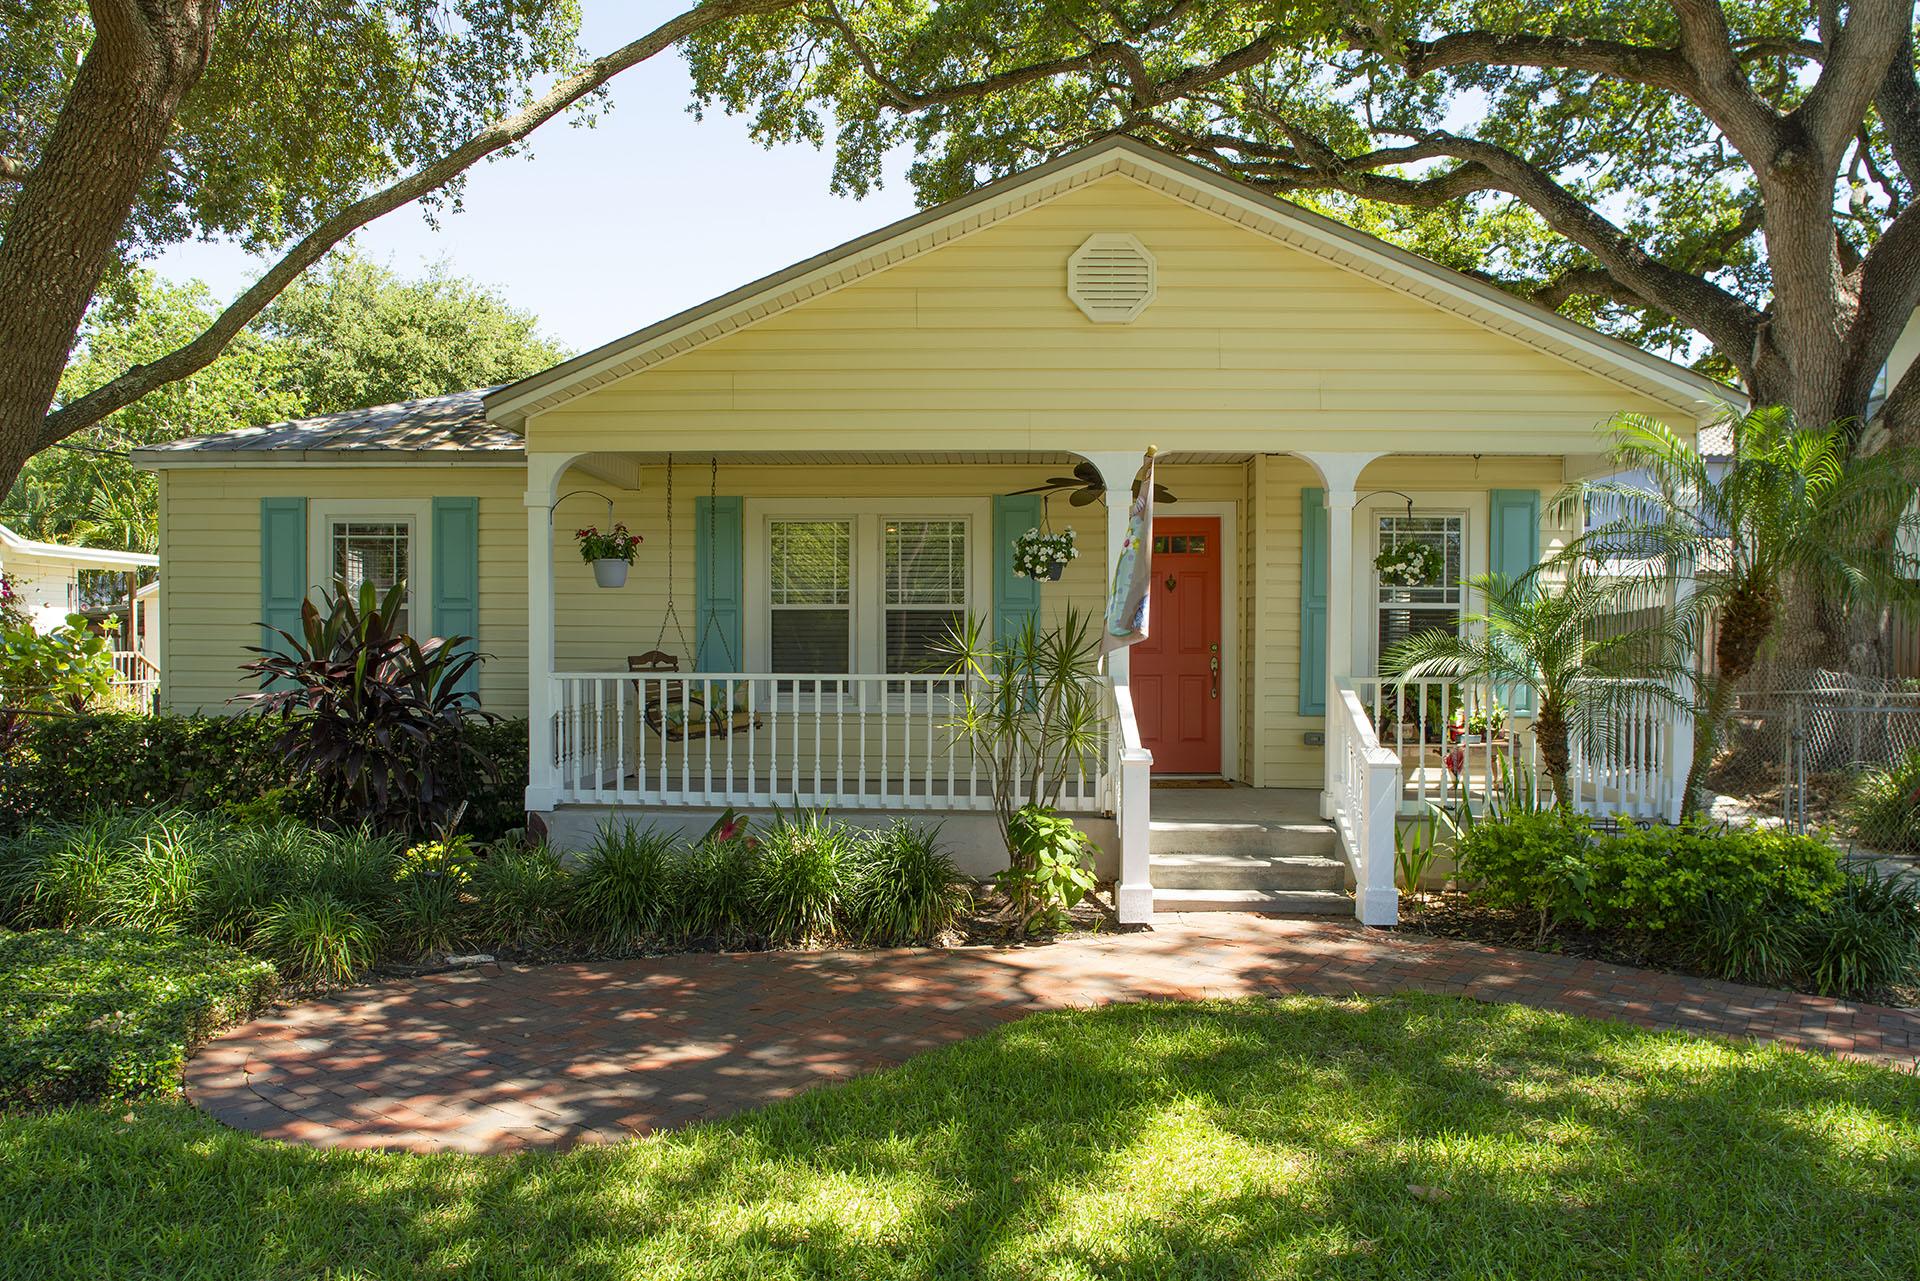 Virginia Park | 4207 W San Luis St. | Tampa, FL